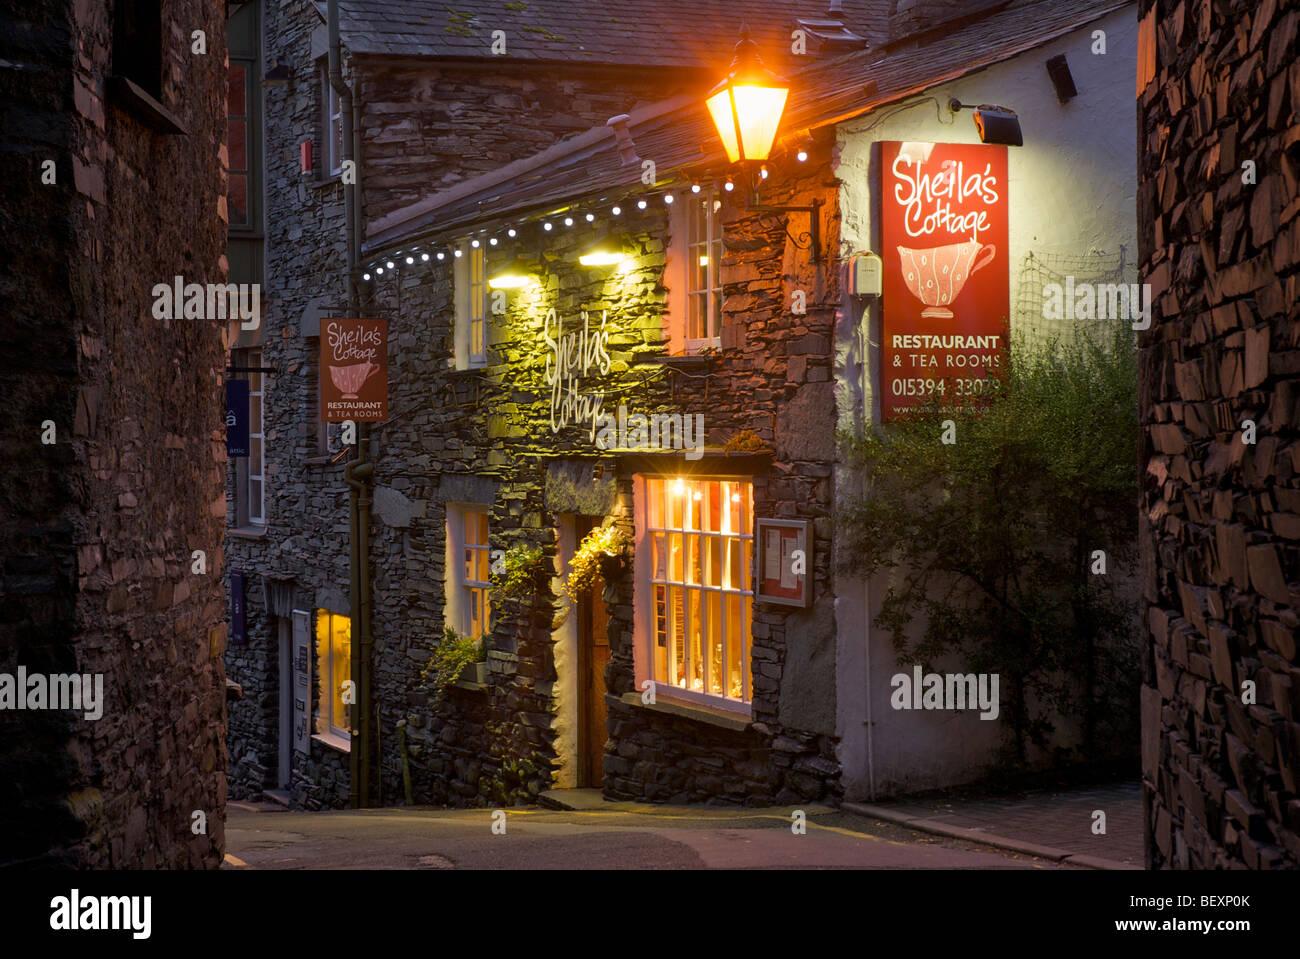 Sheila's Cottage, restaurant, The Slack, Ambleside, Lake District National Park, Cumbria, England UK - Stock Image